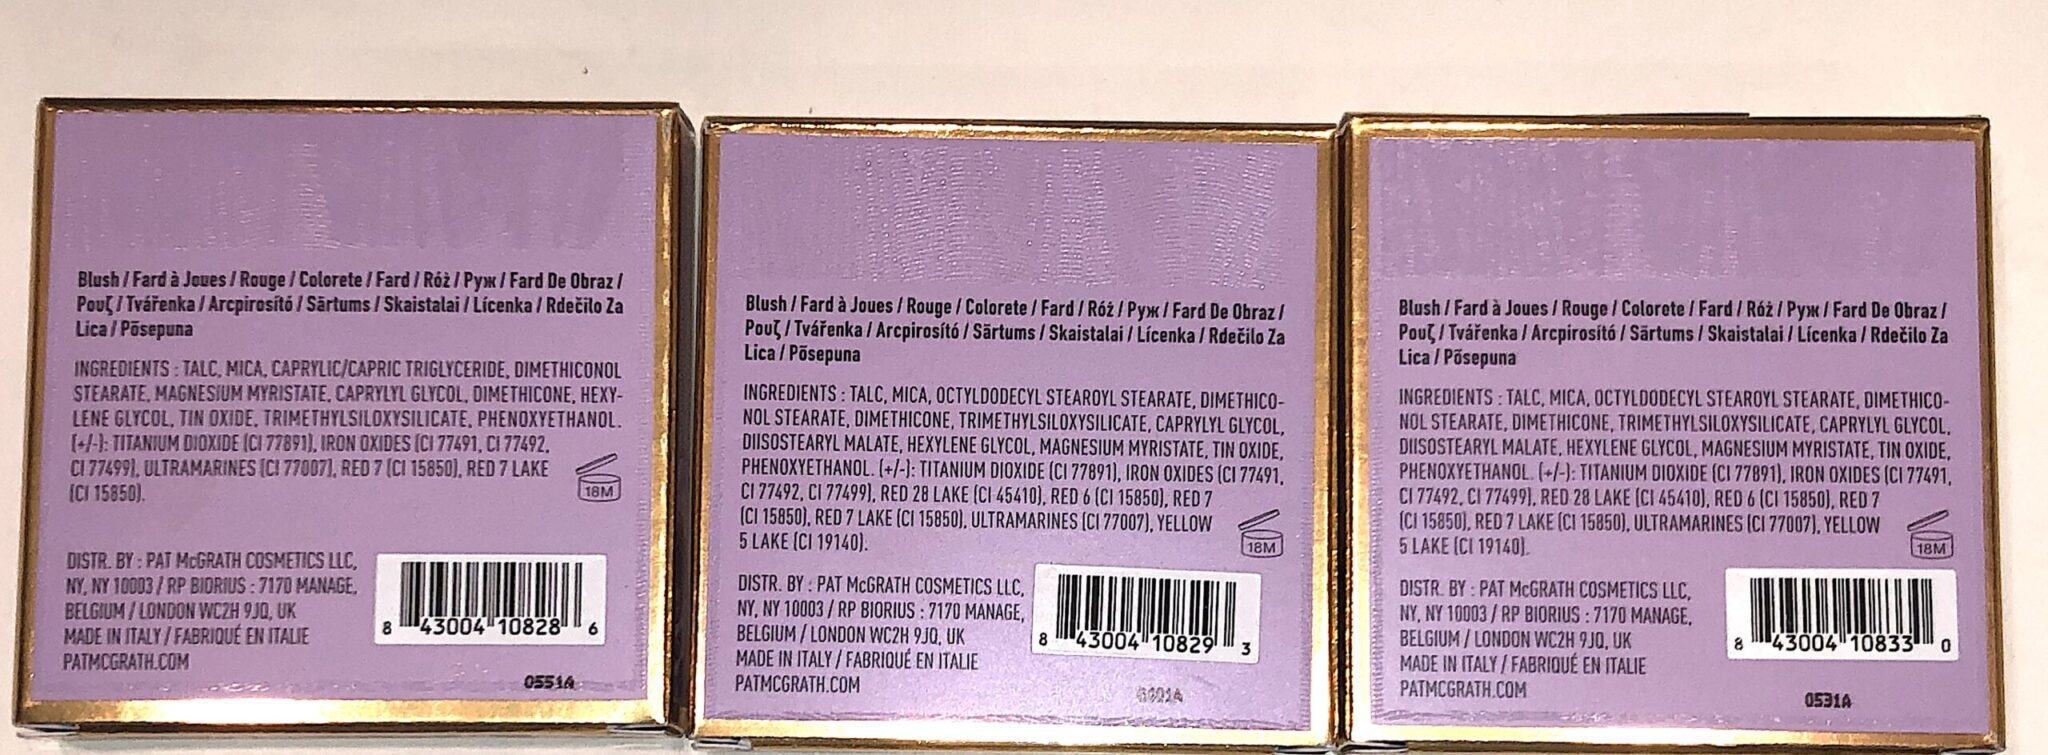 PAT MCGRATH DIVINE ROSE NUDE FLEURTATION BUNDLE L TO R: FLEURTATIOUS, NUDE VENUS, AND DESERT ORCHID